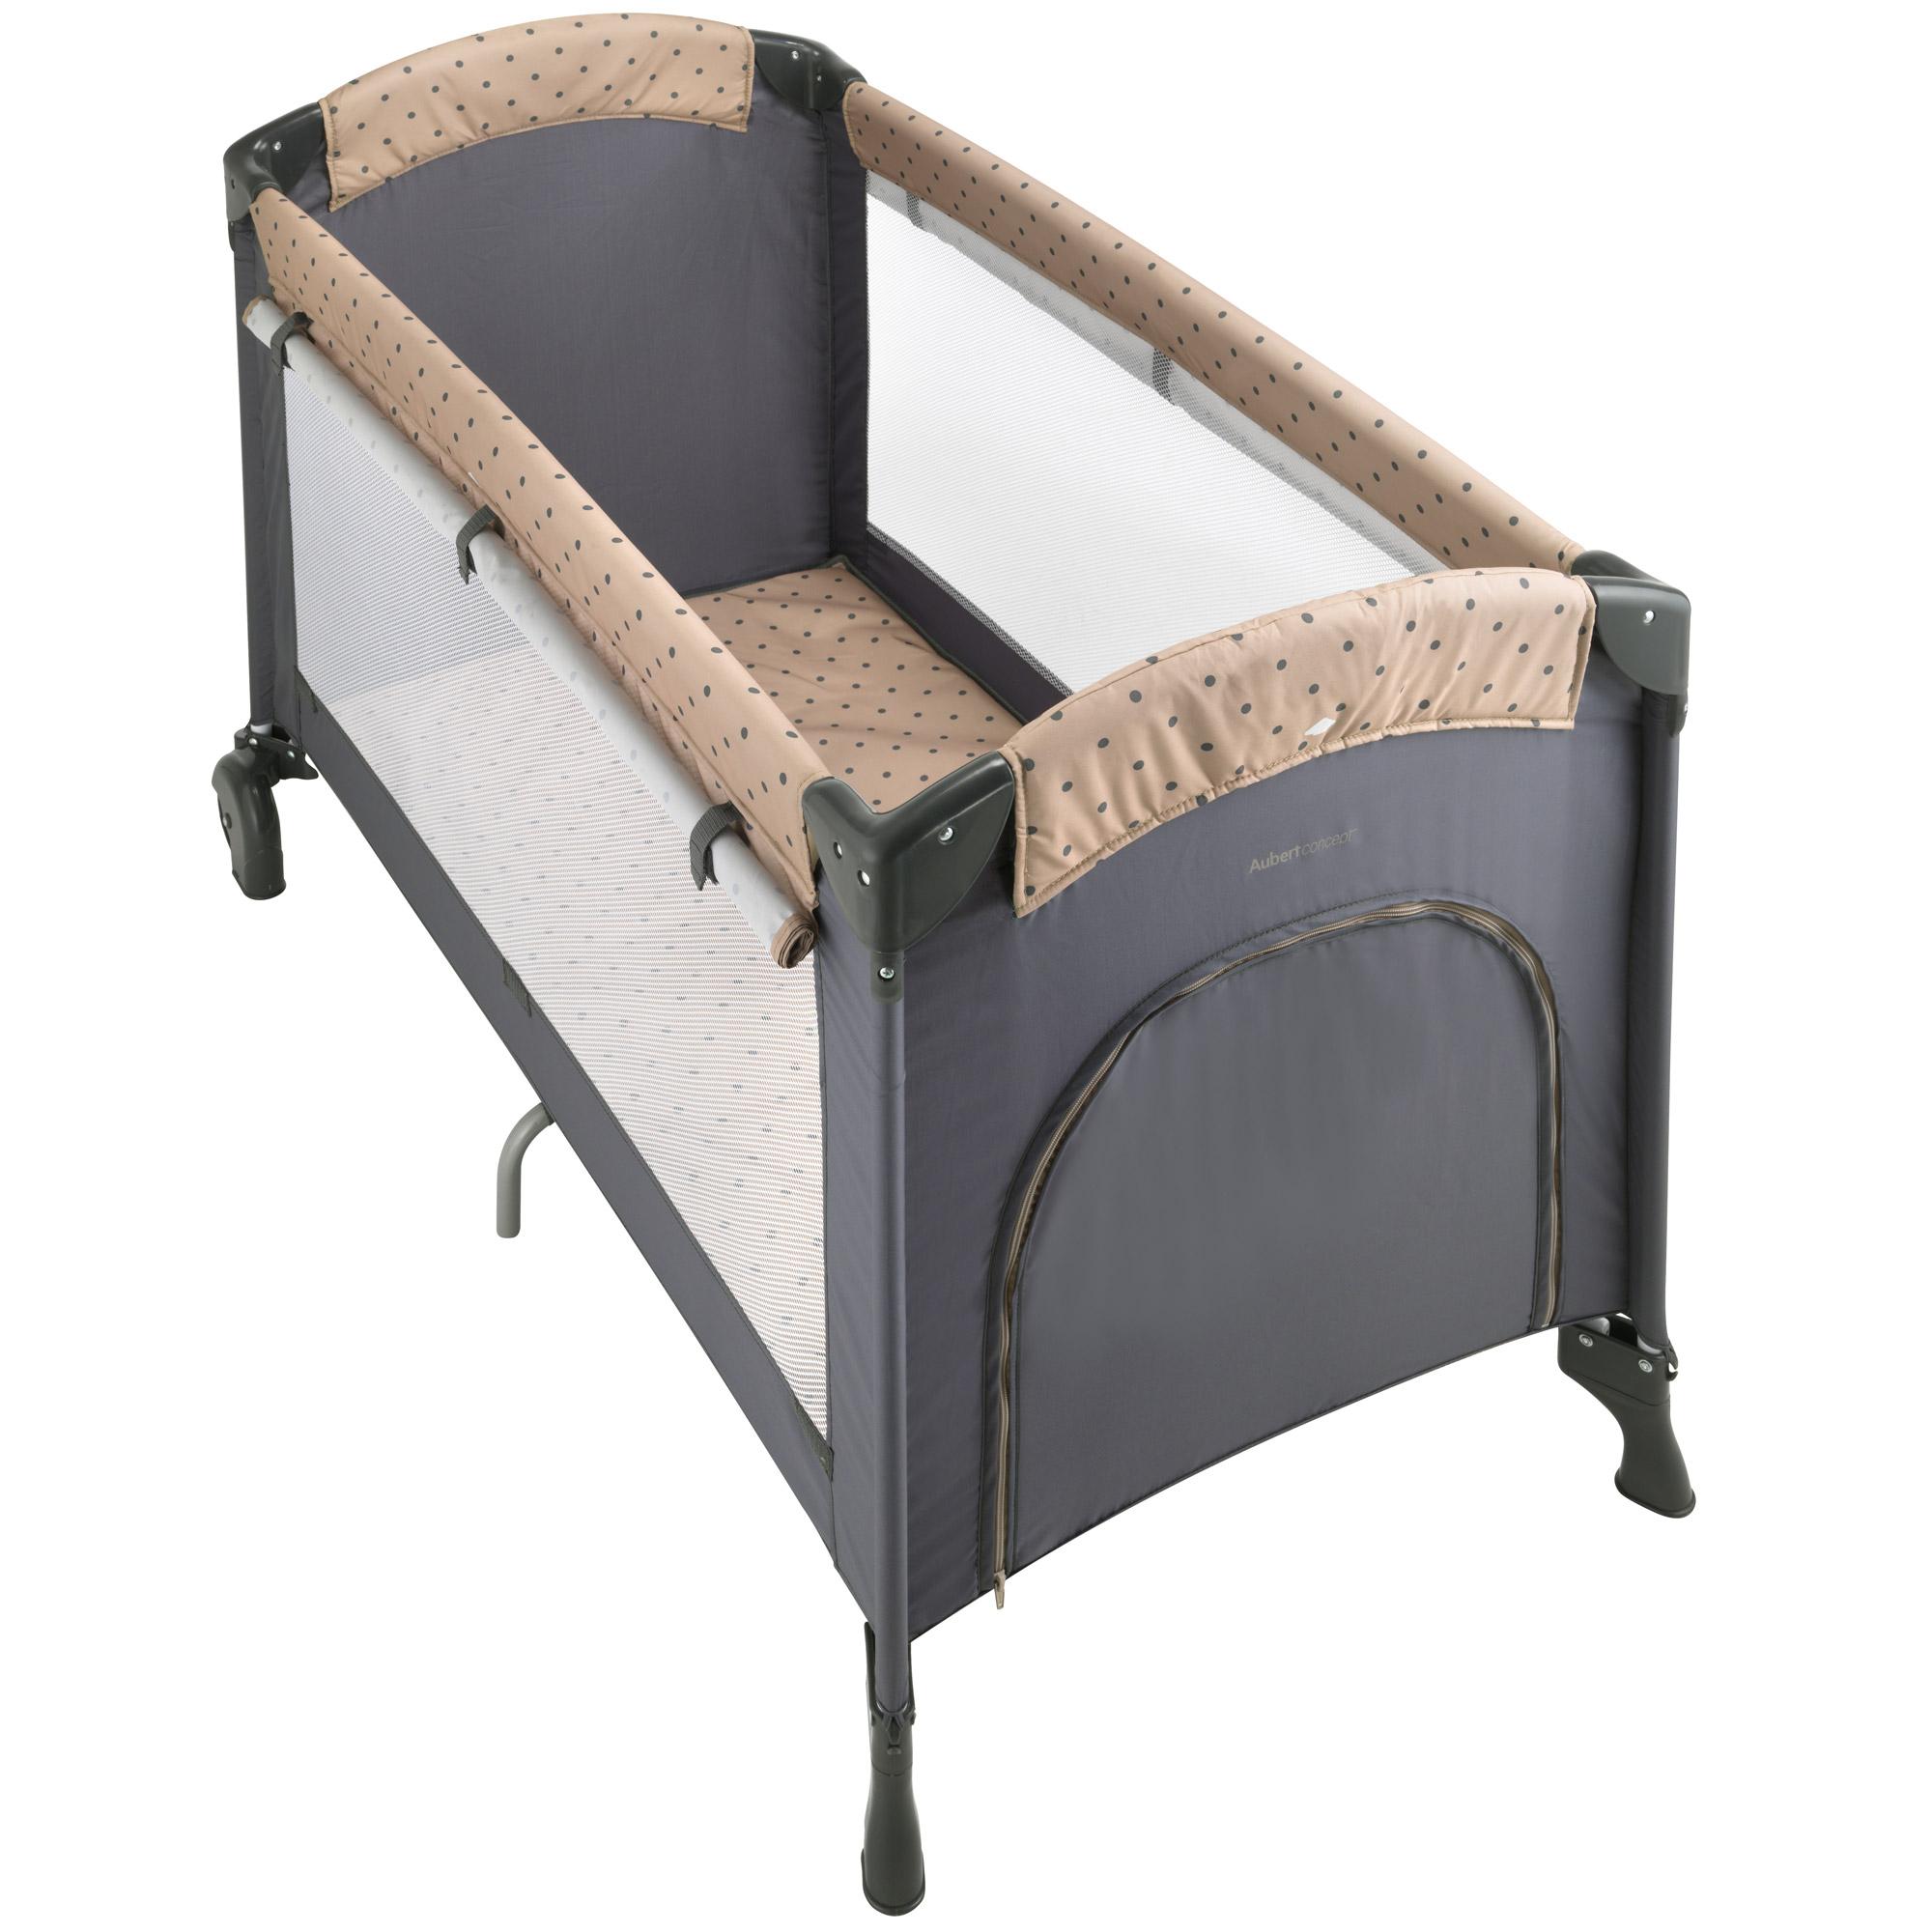 lit deluxe winnie de aubert concept lits parapluies aubert. Black Bedroom Furniture Sets. Home Design Ideas